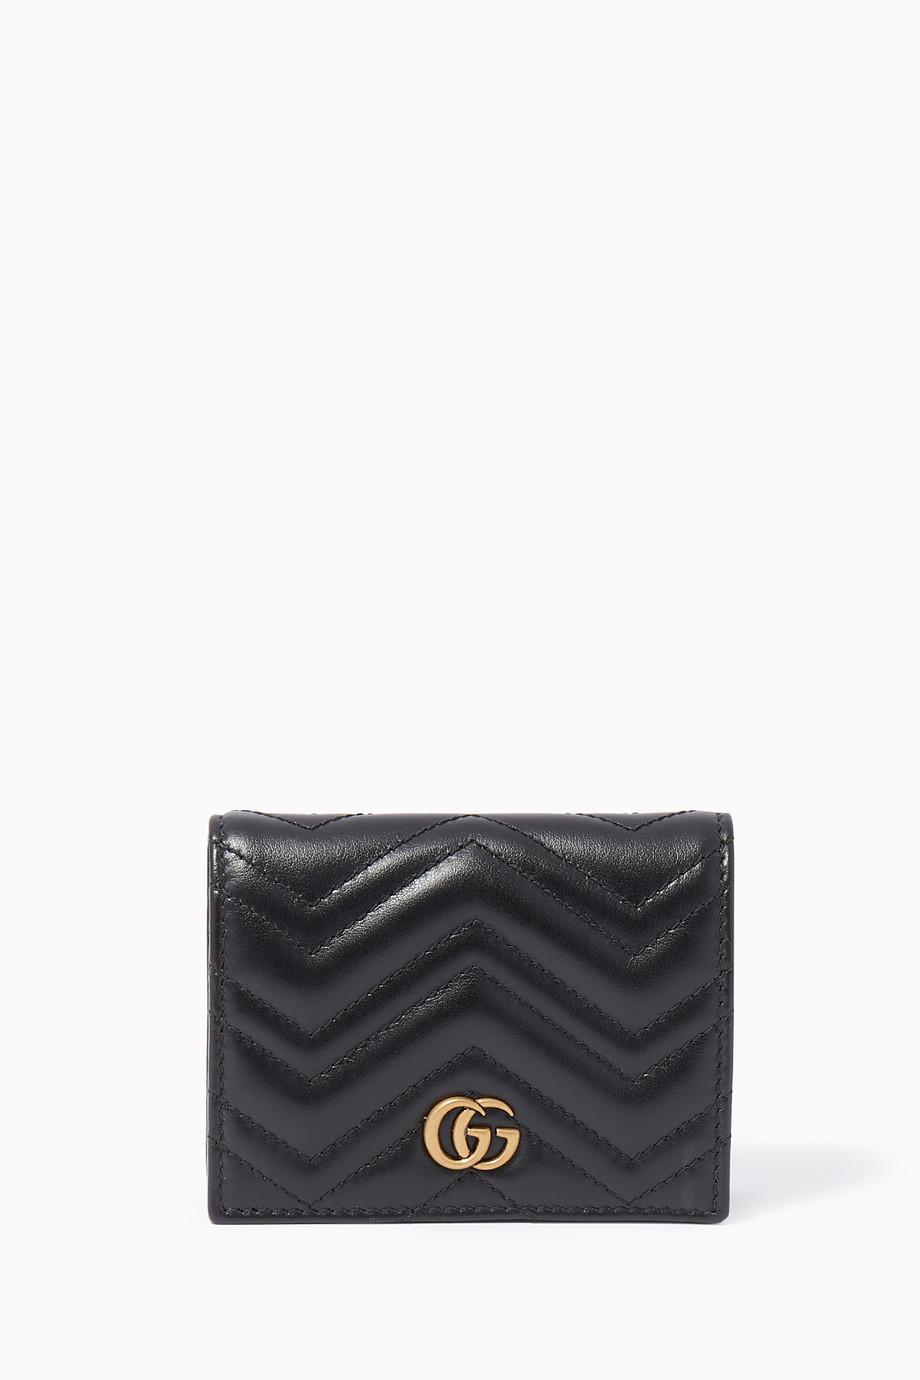 2b940ff00c3f69 Shop Gucci Black Black GG Marmont Matelassé Wallet for Women ...